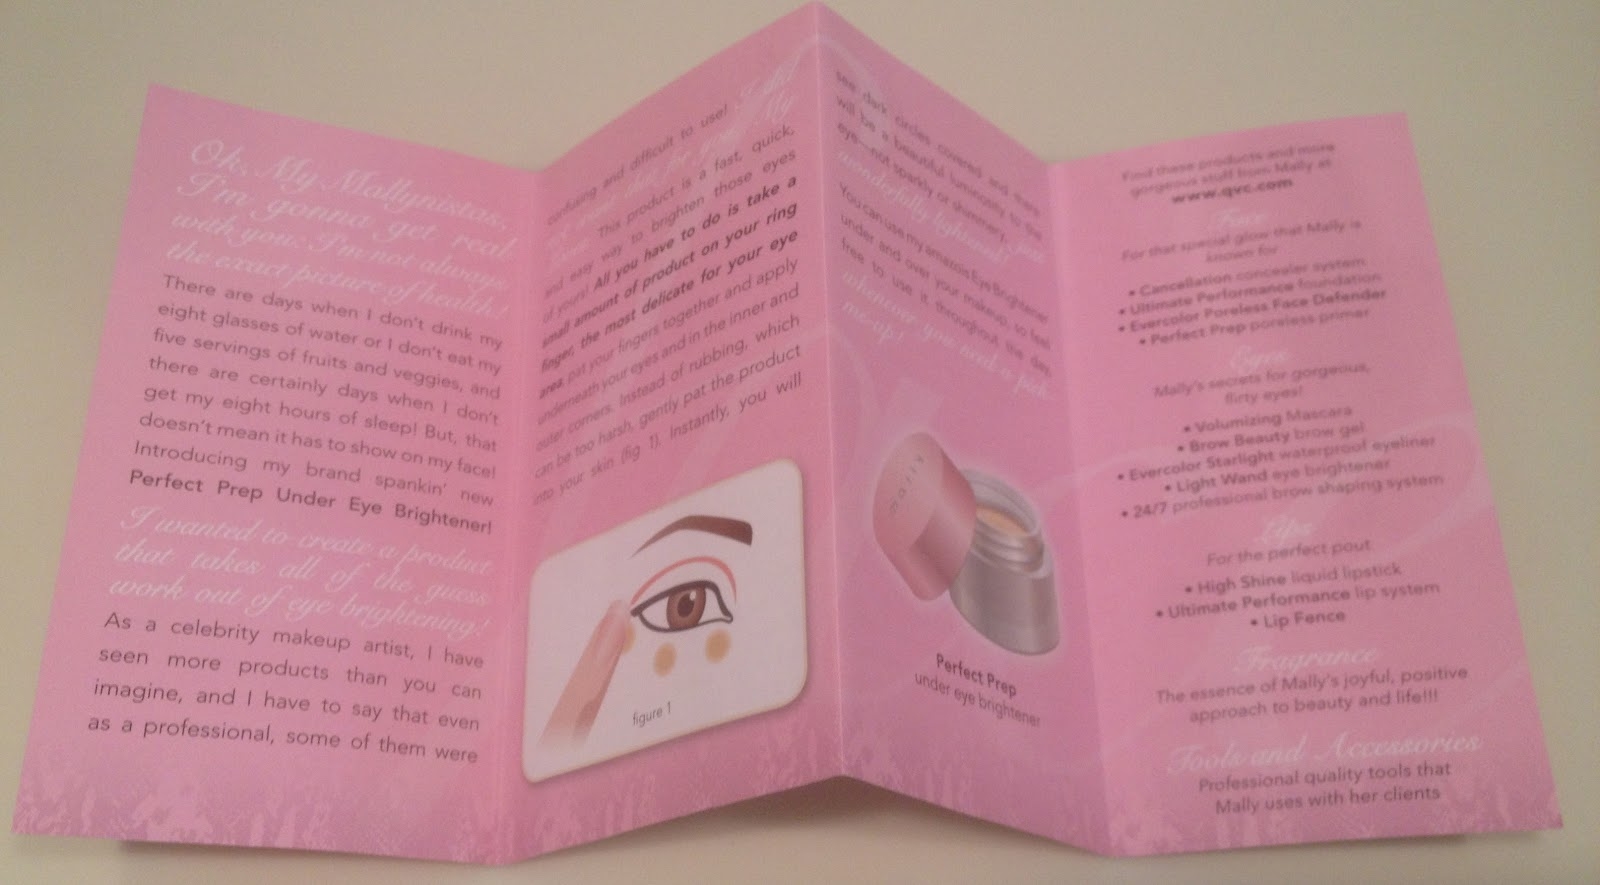 Booyah Beauty Mally Perfect Prep Under Eye Brightener Holy Grail